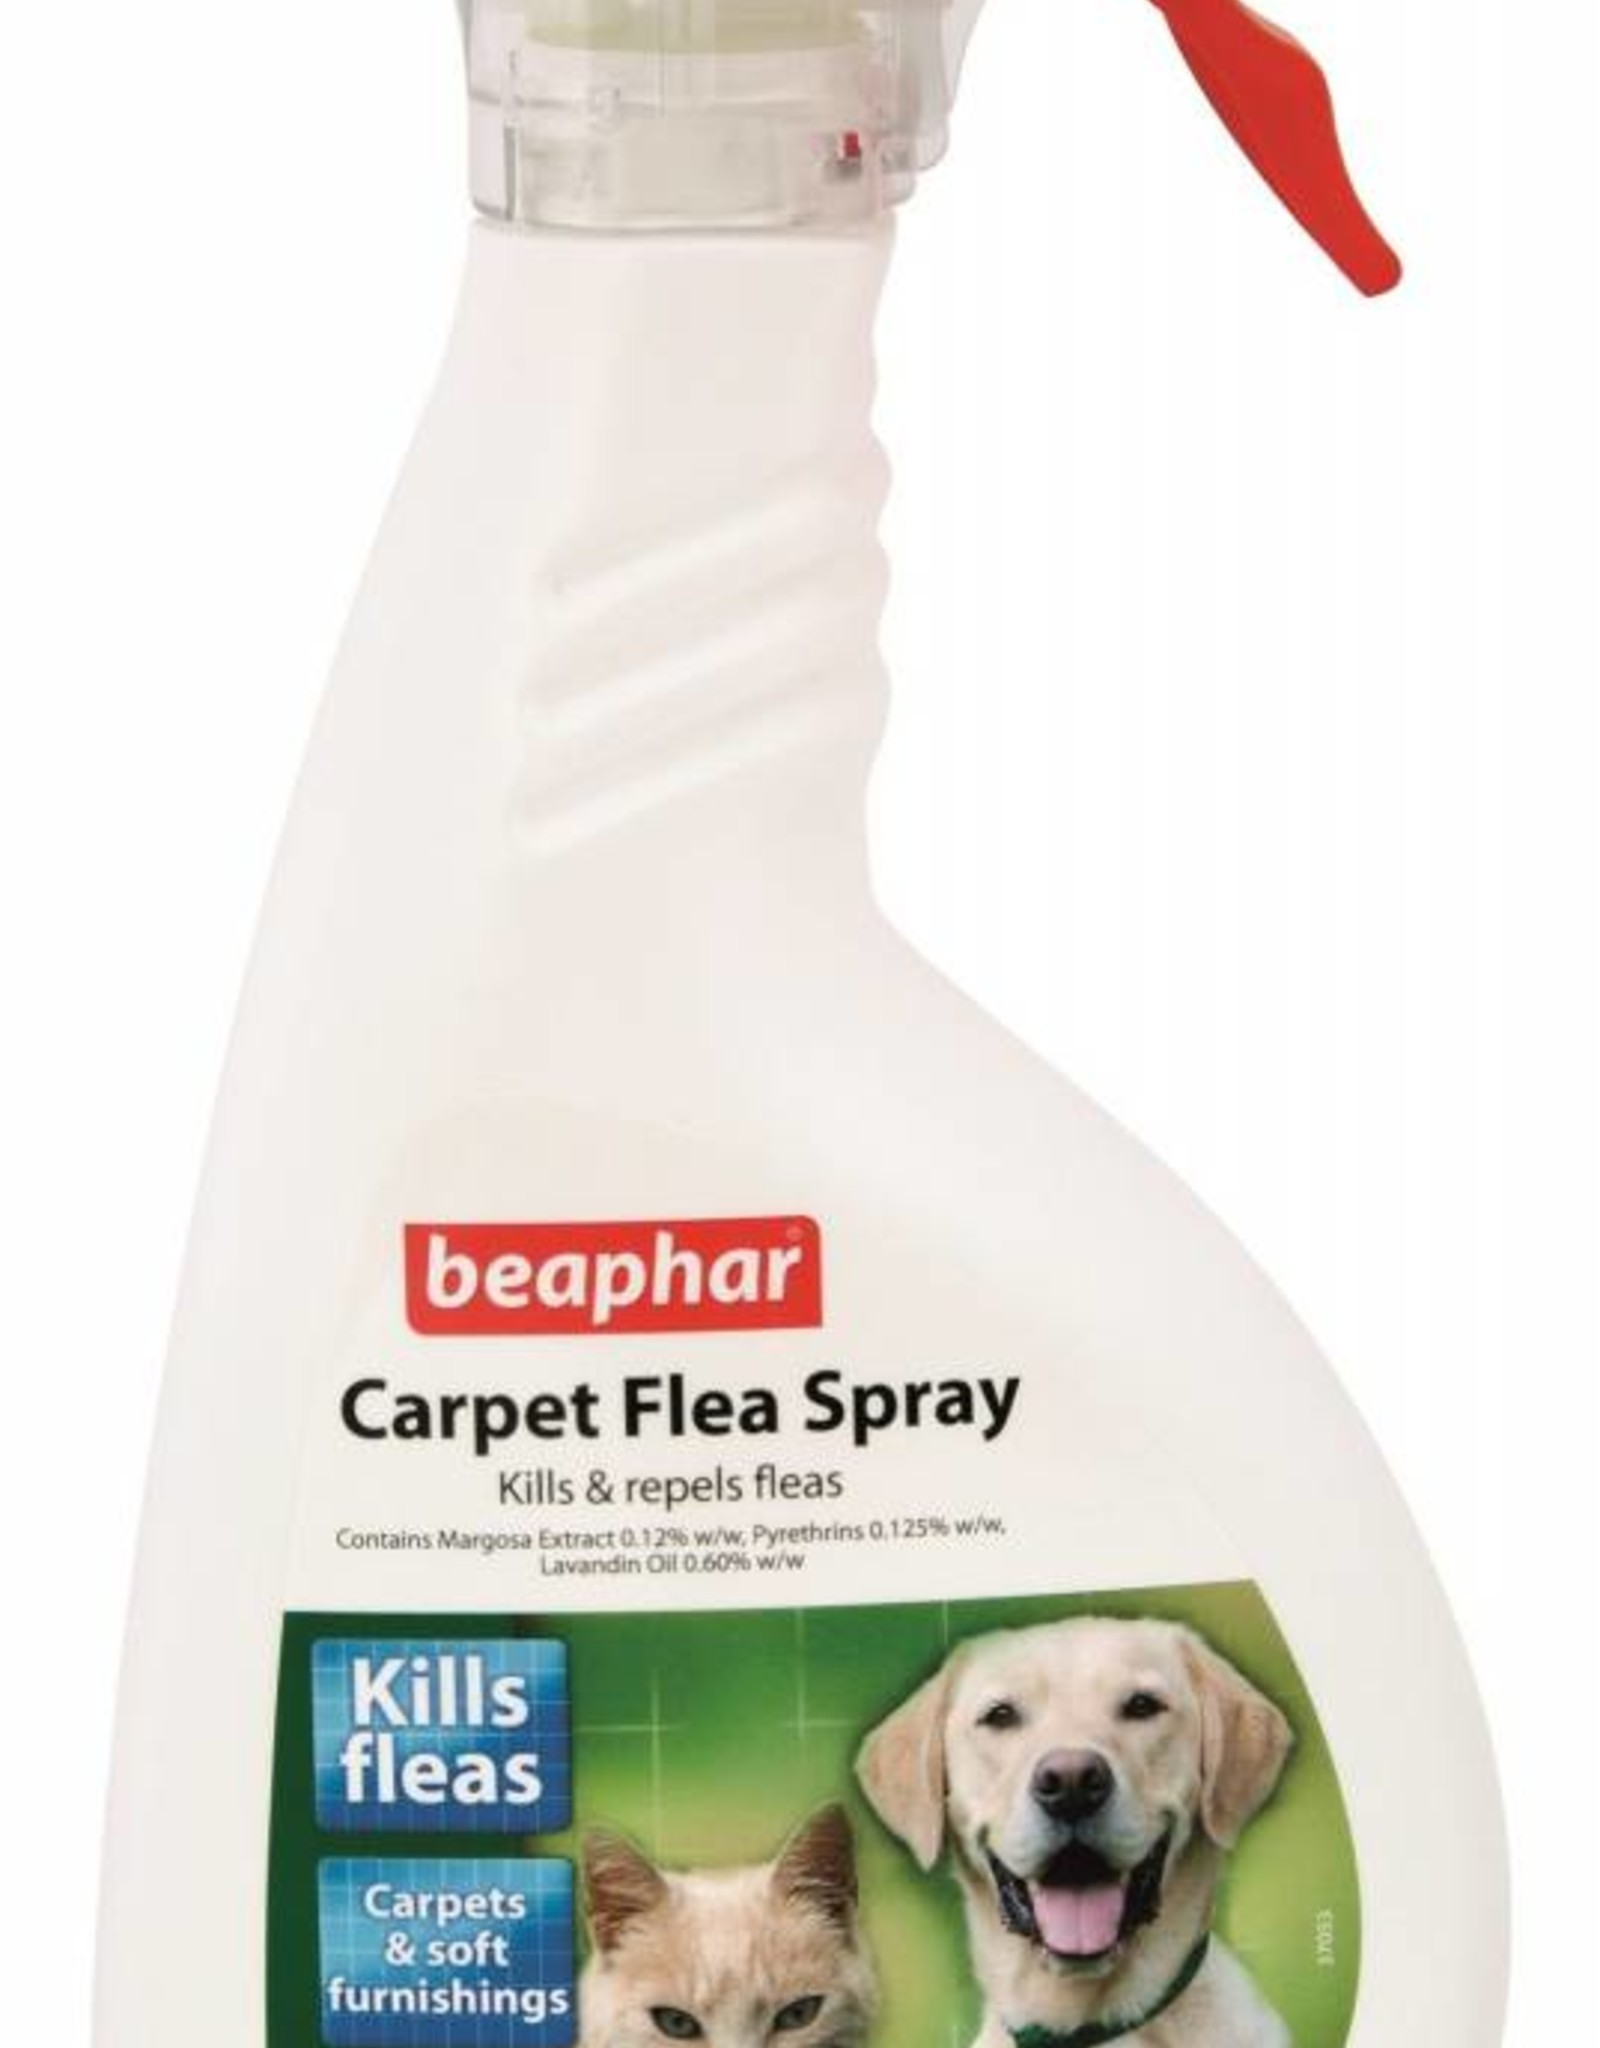 Beaphar Carpet Flea Spray, 400ml